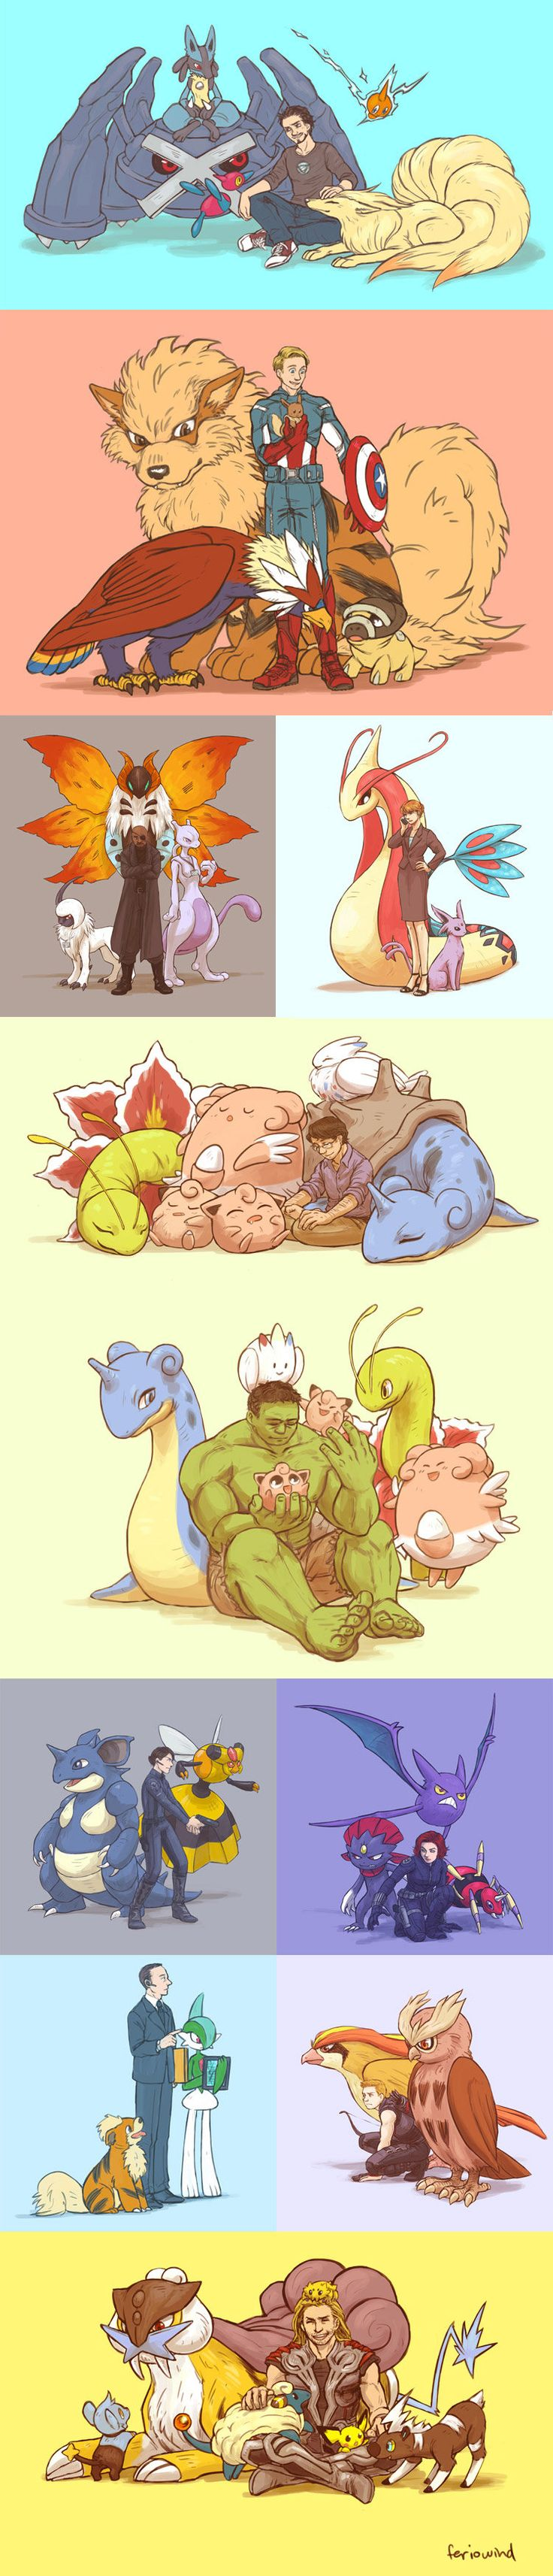 Best pokemon images on pinterest pokemon images pokemon